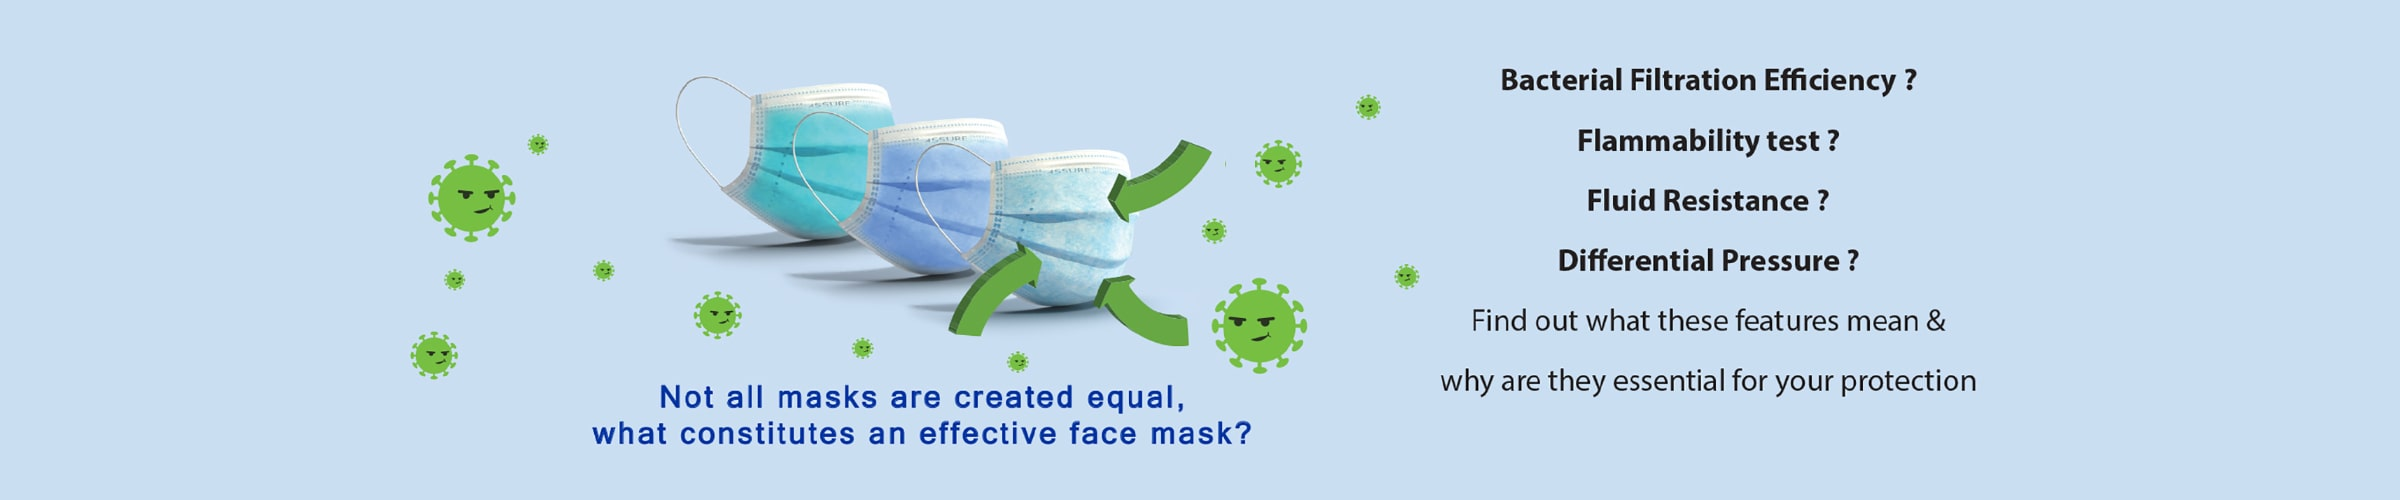 Mask_Article_Banner-min.jpg